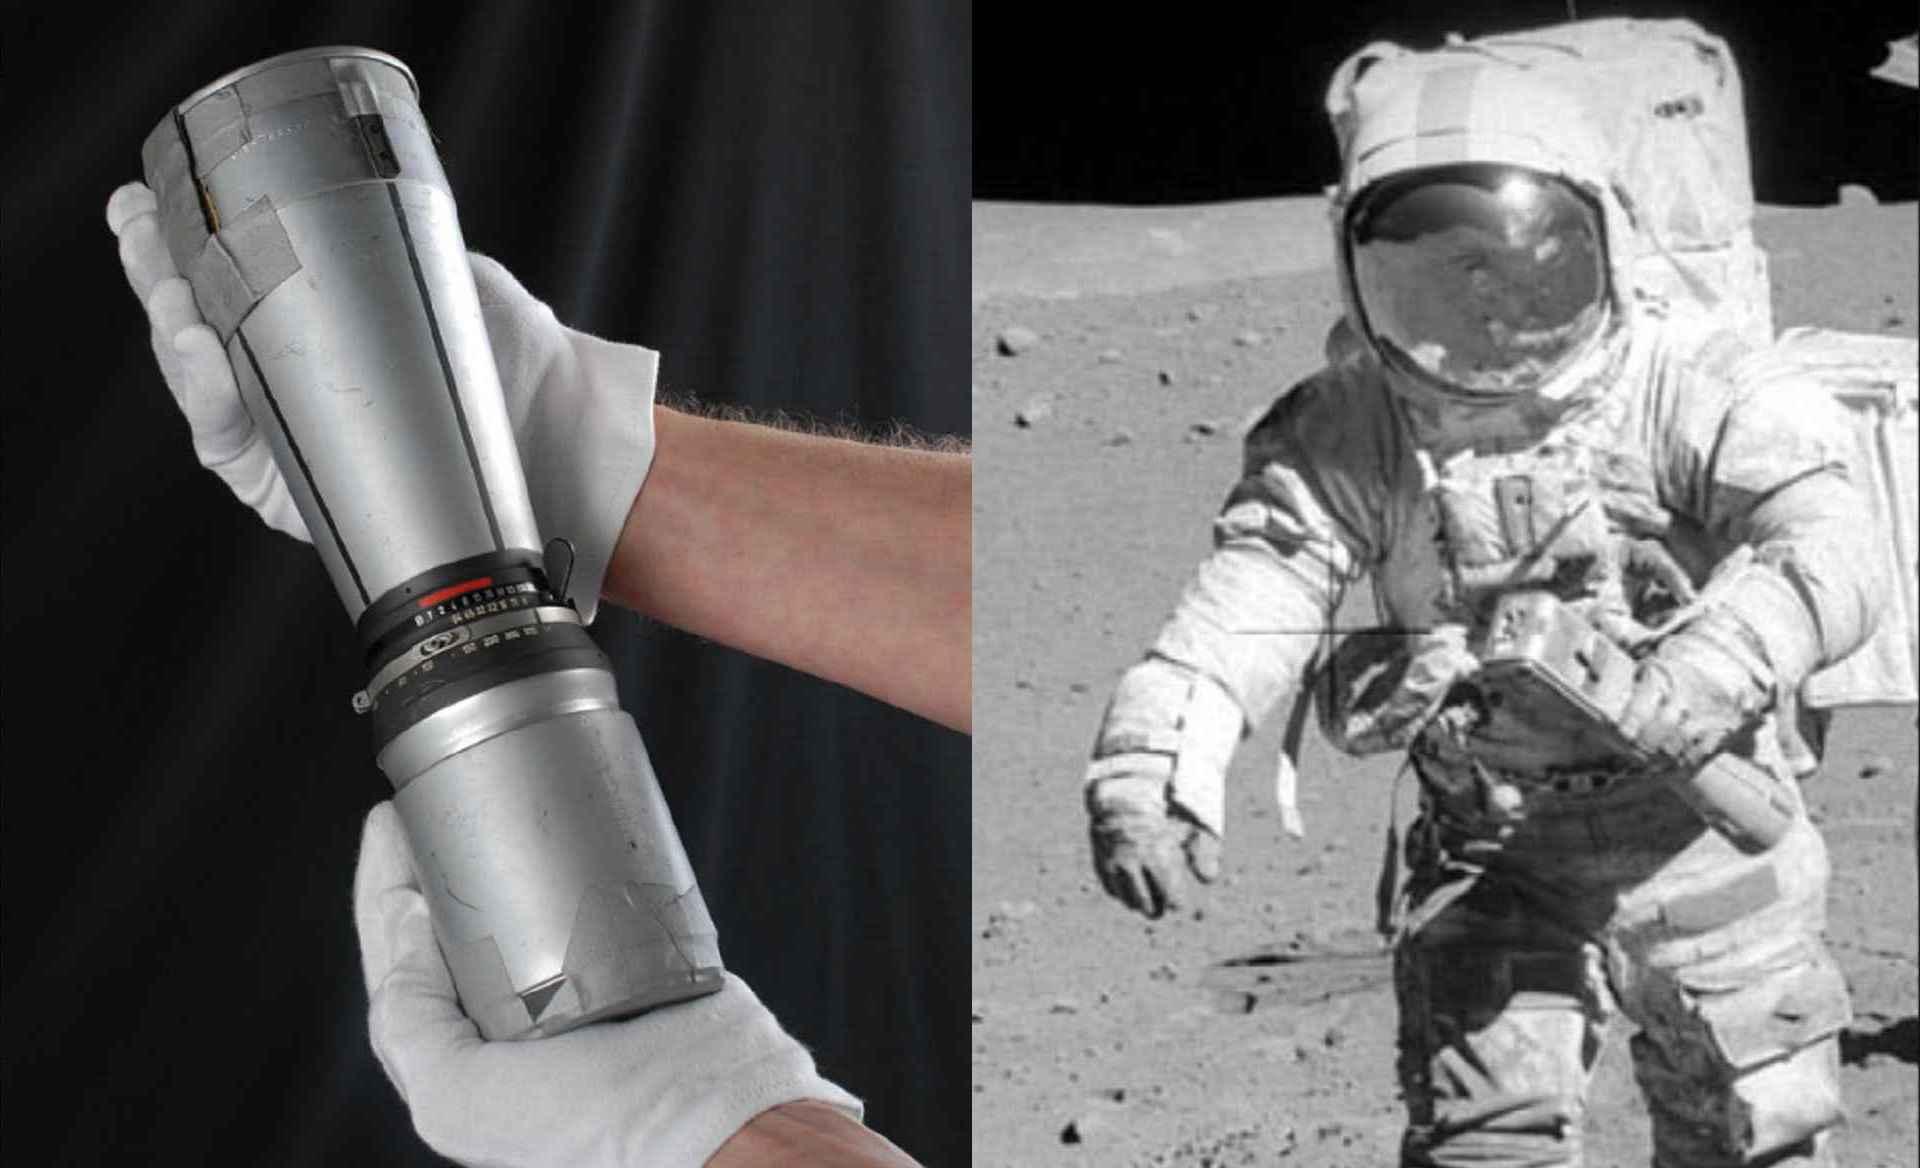 Carl Zeiss Tessar 500mm f8 - Hậu duệ mặt trăng   50mm Vietnam